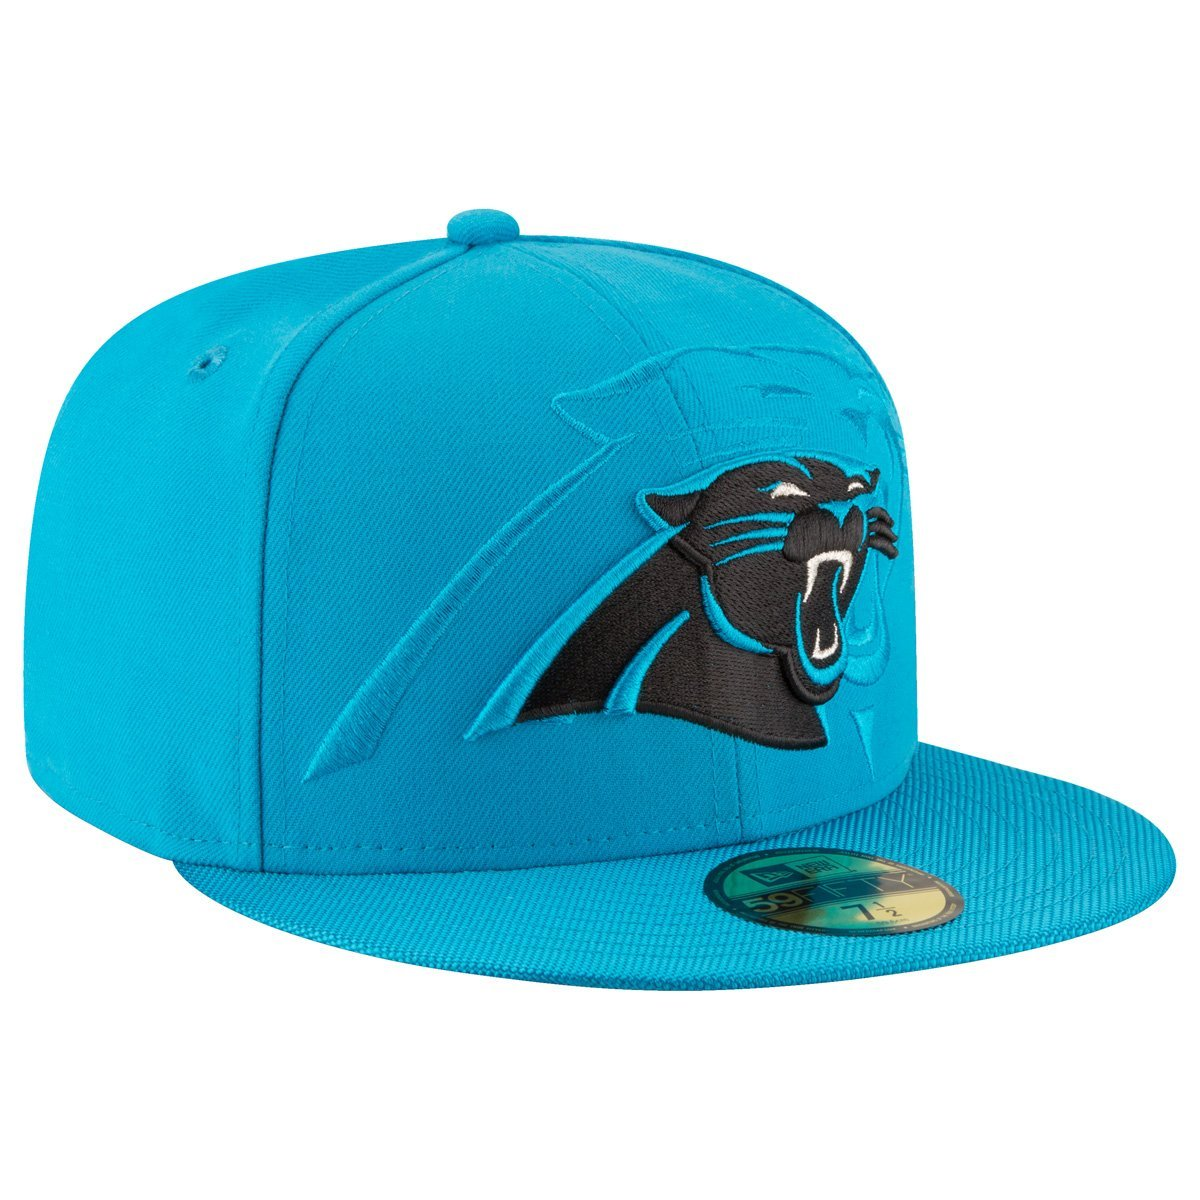 d5173330b42 New Era Nfl Sideline 59Fifty Carpan Otc - Cap line Carolina Panthers for  Man